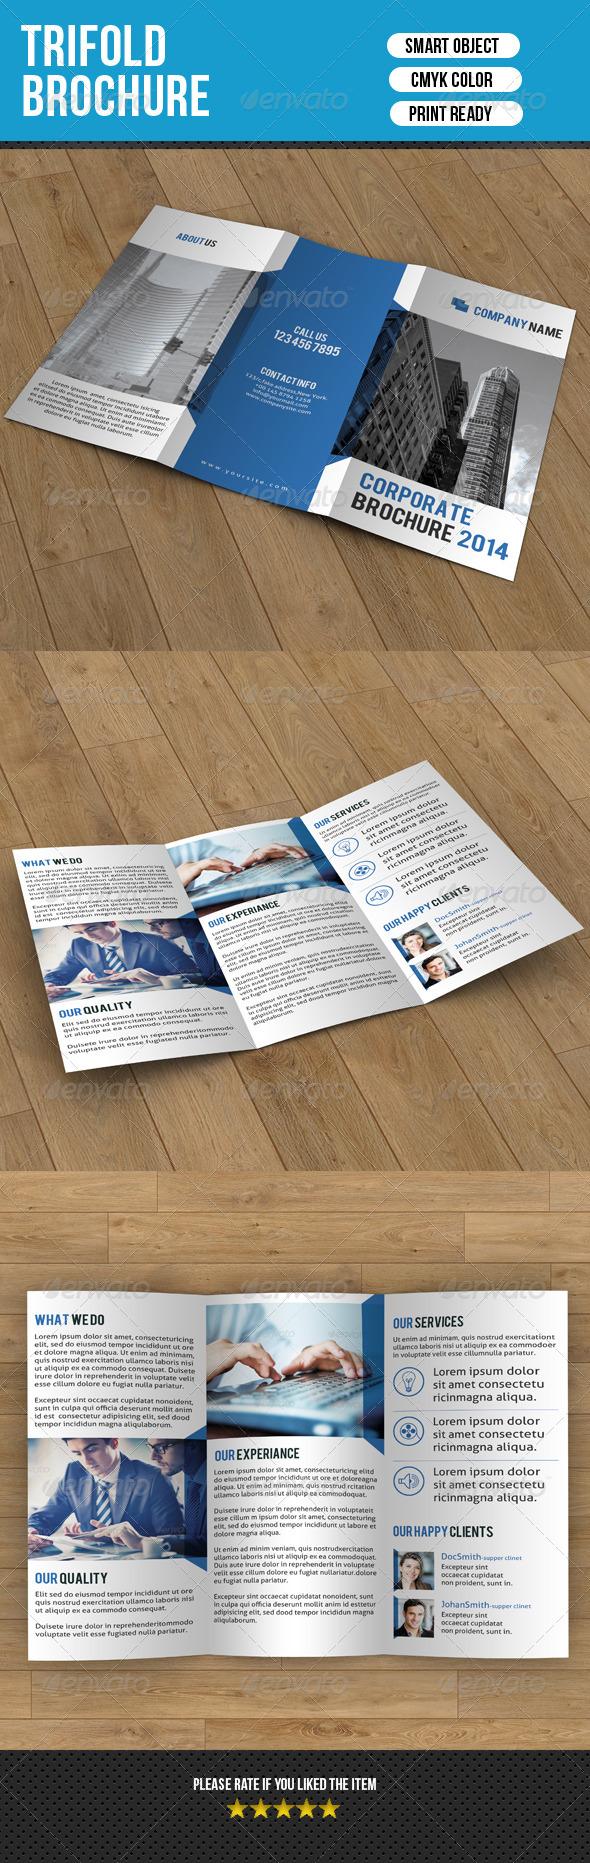 GraphicRiver Trifold Business Brochure-V04 7778793